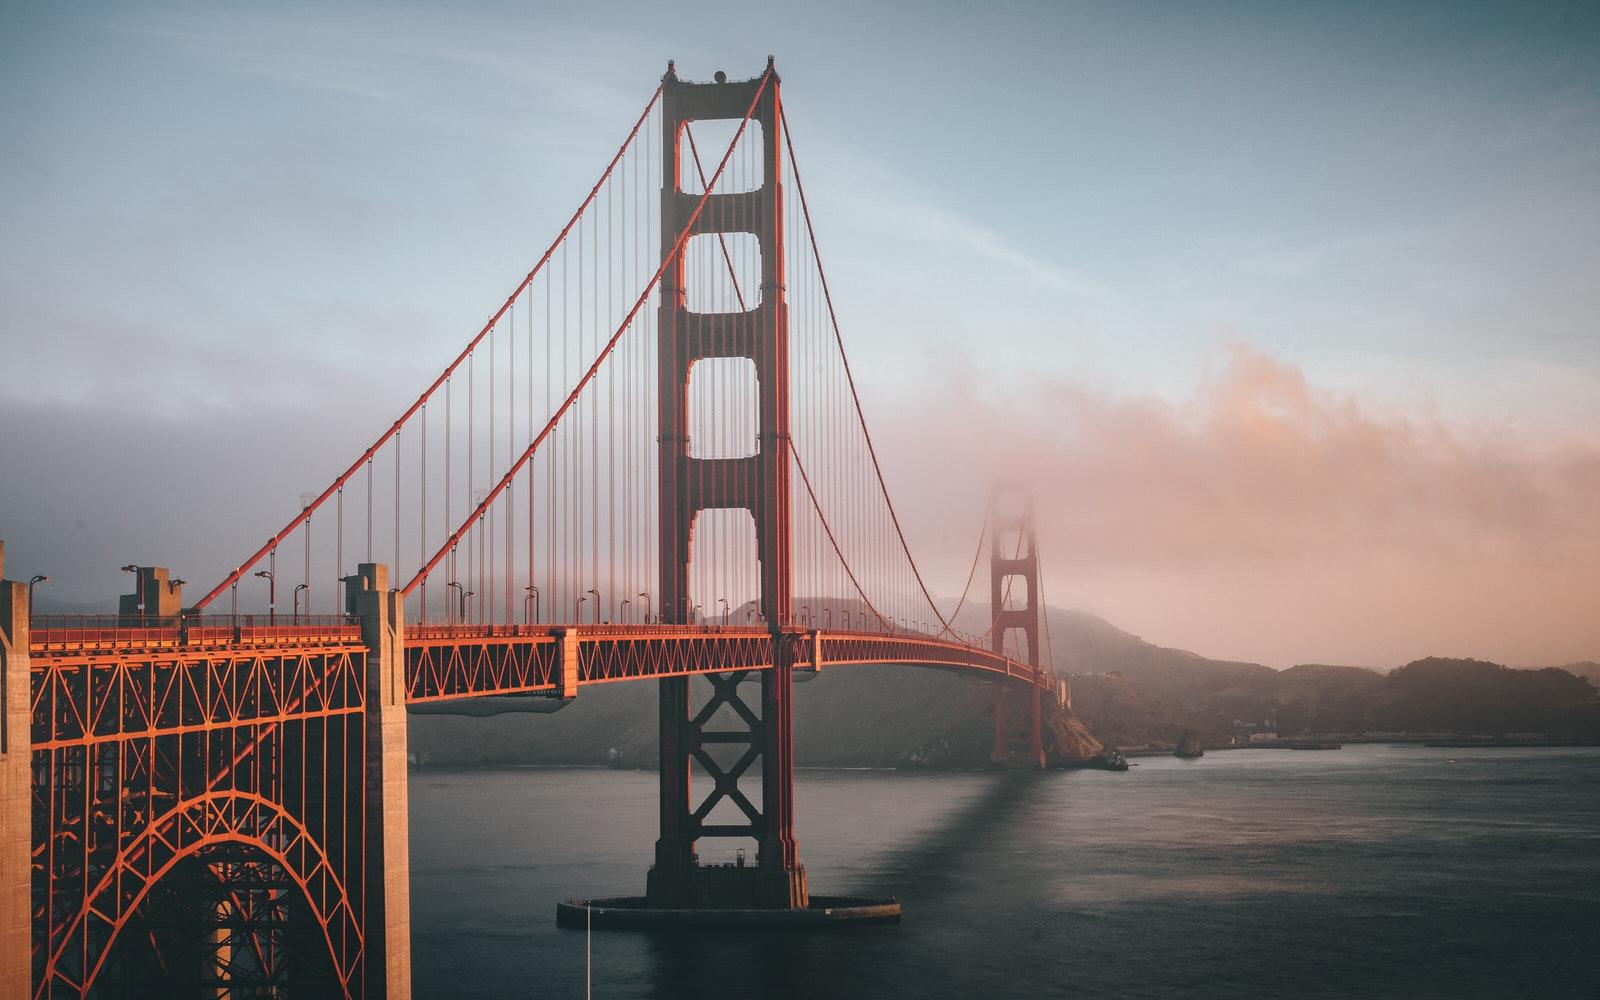 Golden Gate Bridge Fibonacci Sequence